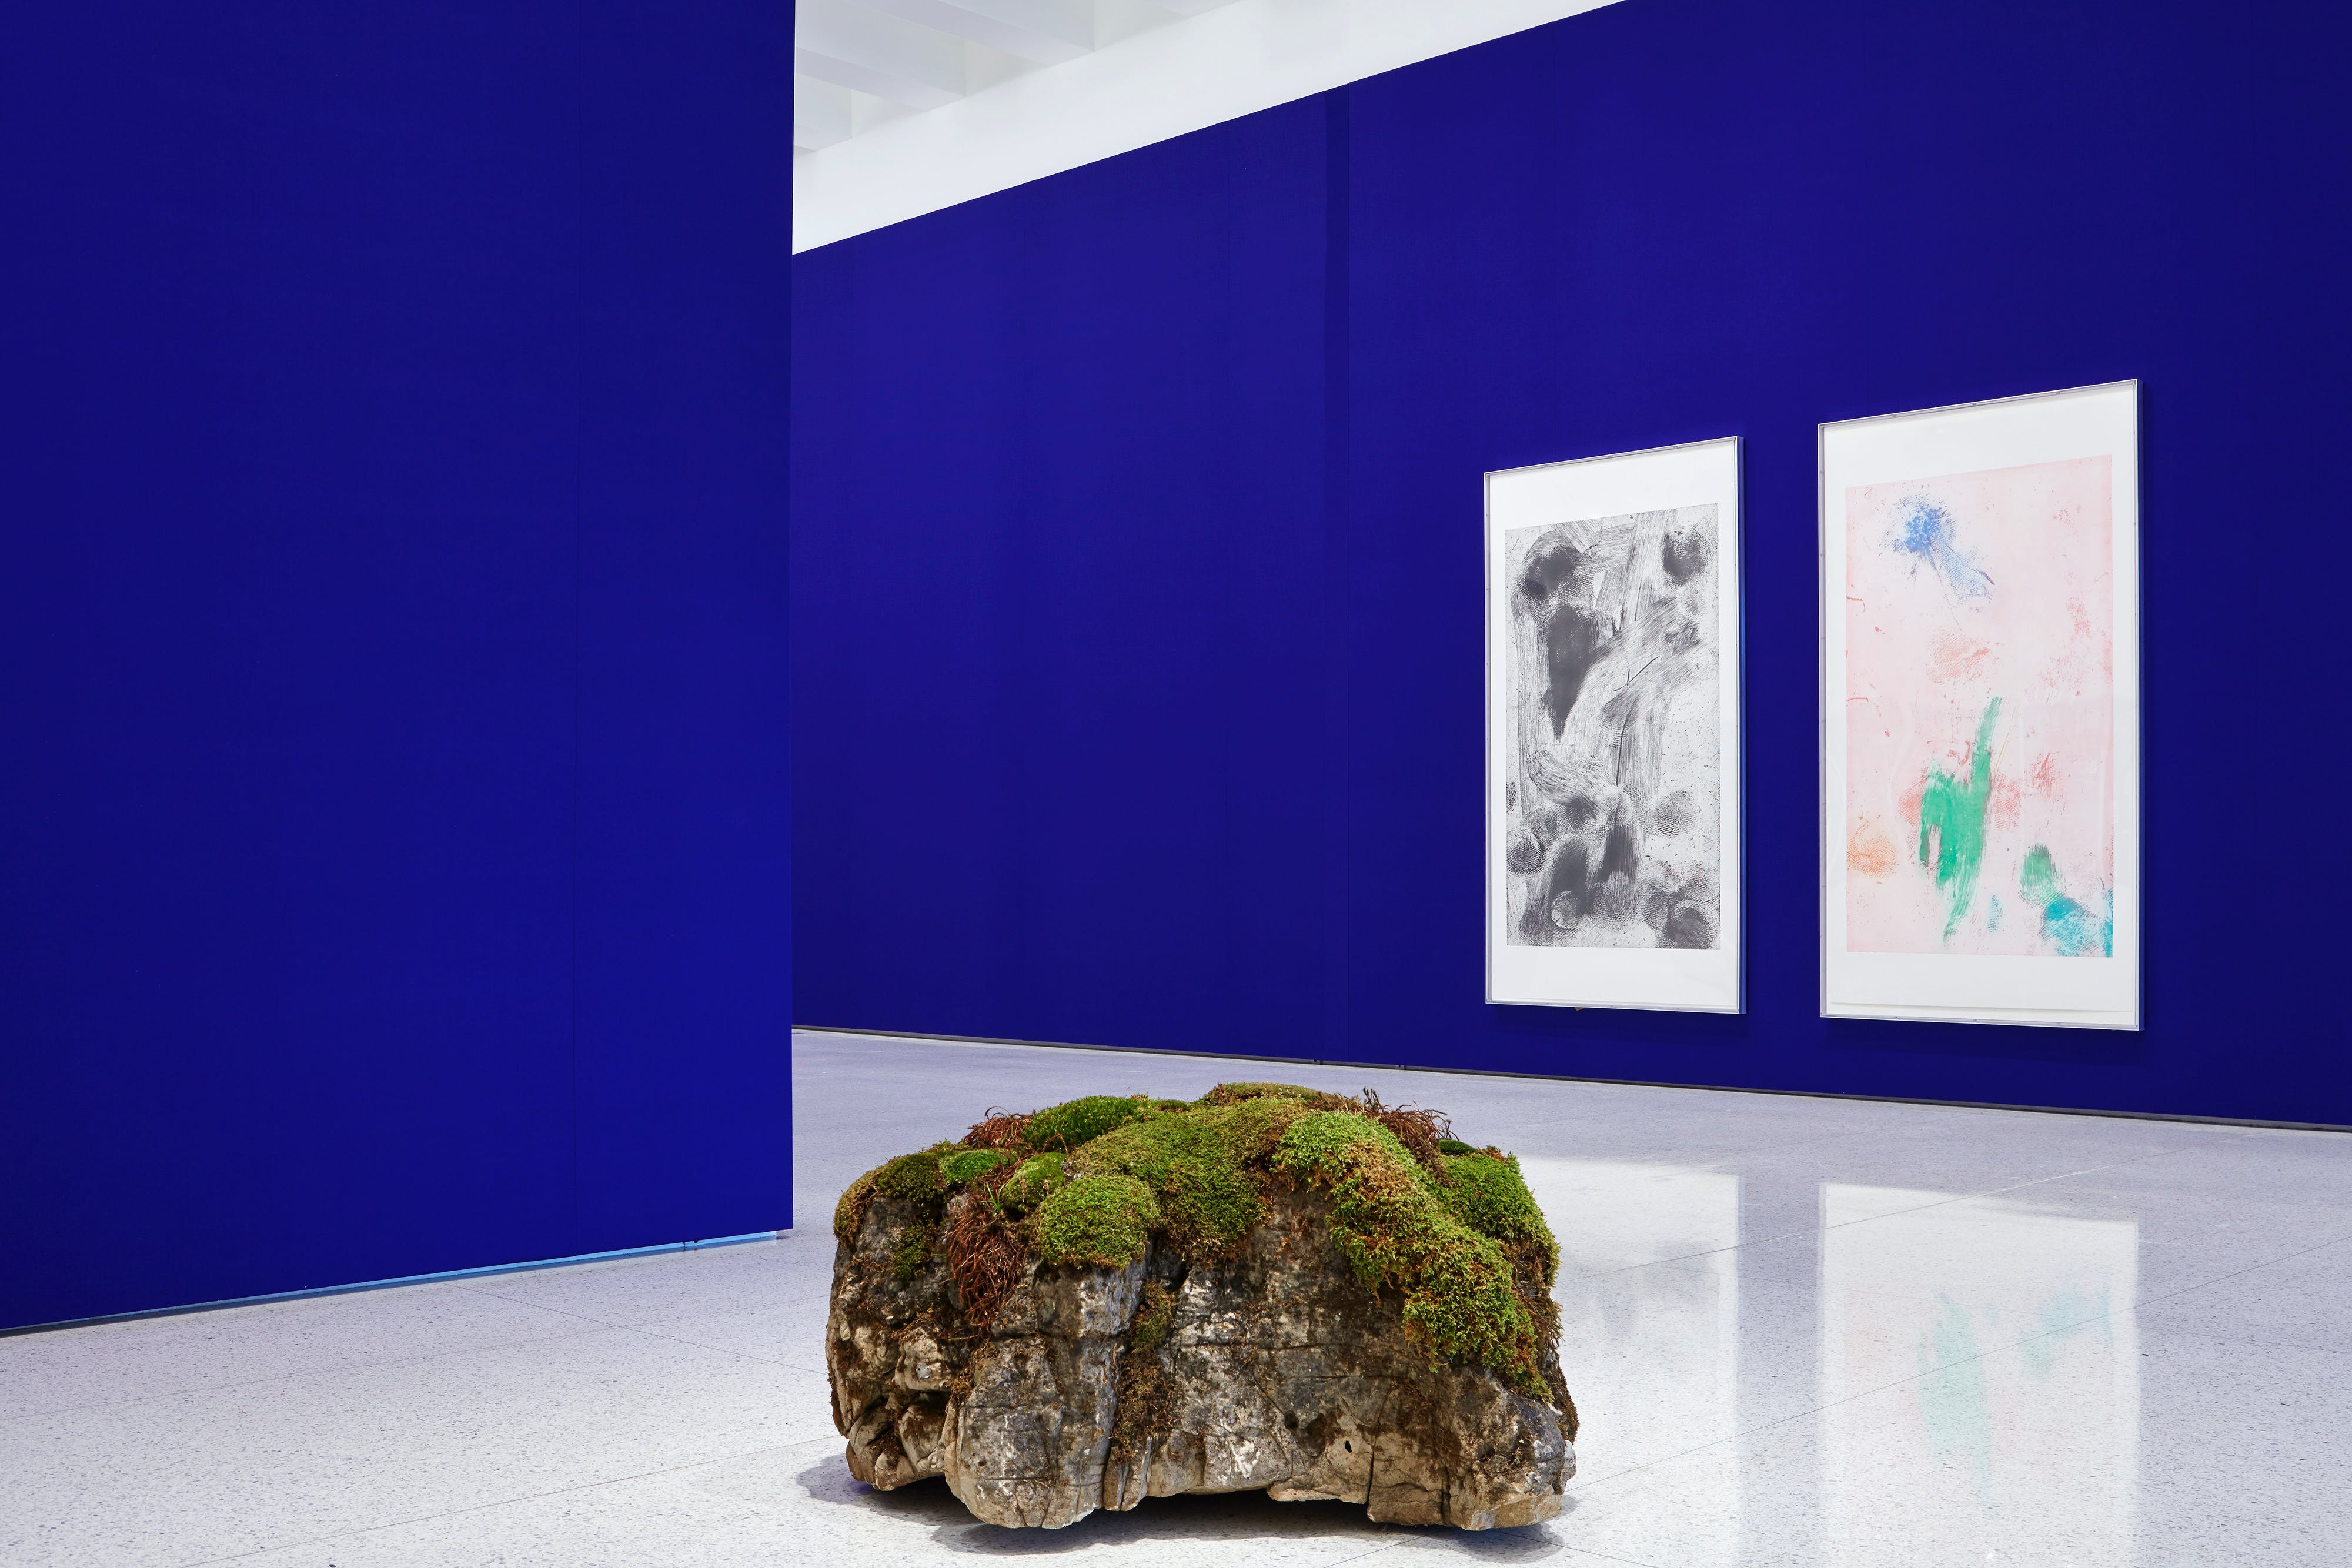 Installation view of Andrea Büttner at the Walker Art Center. Photo: Gene Pittman